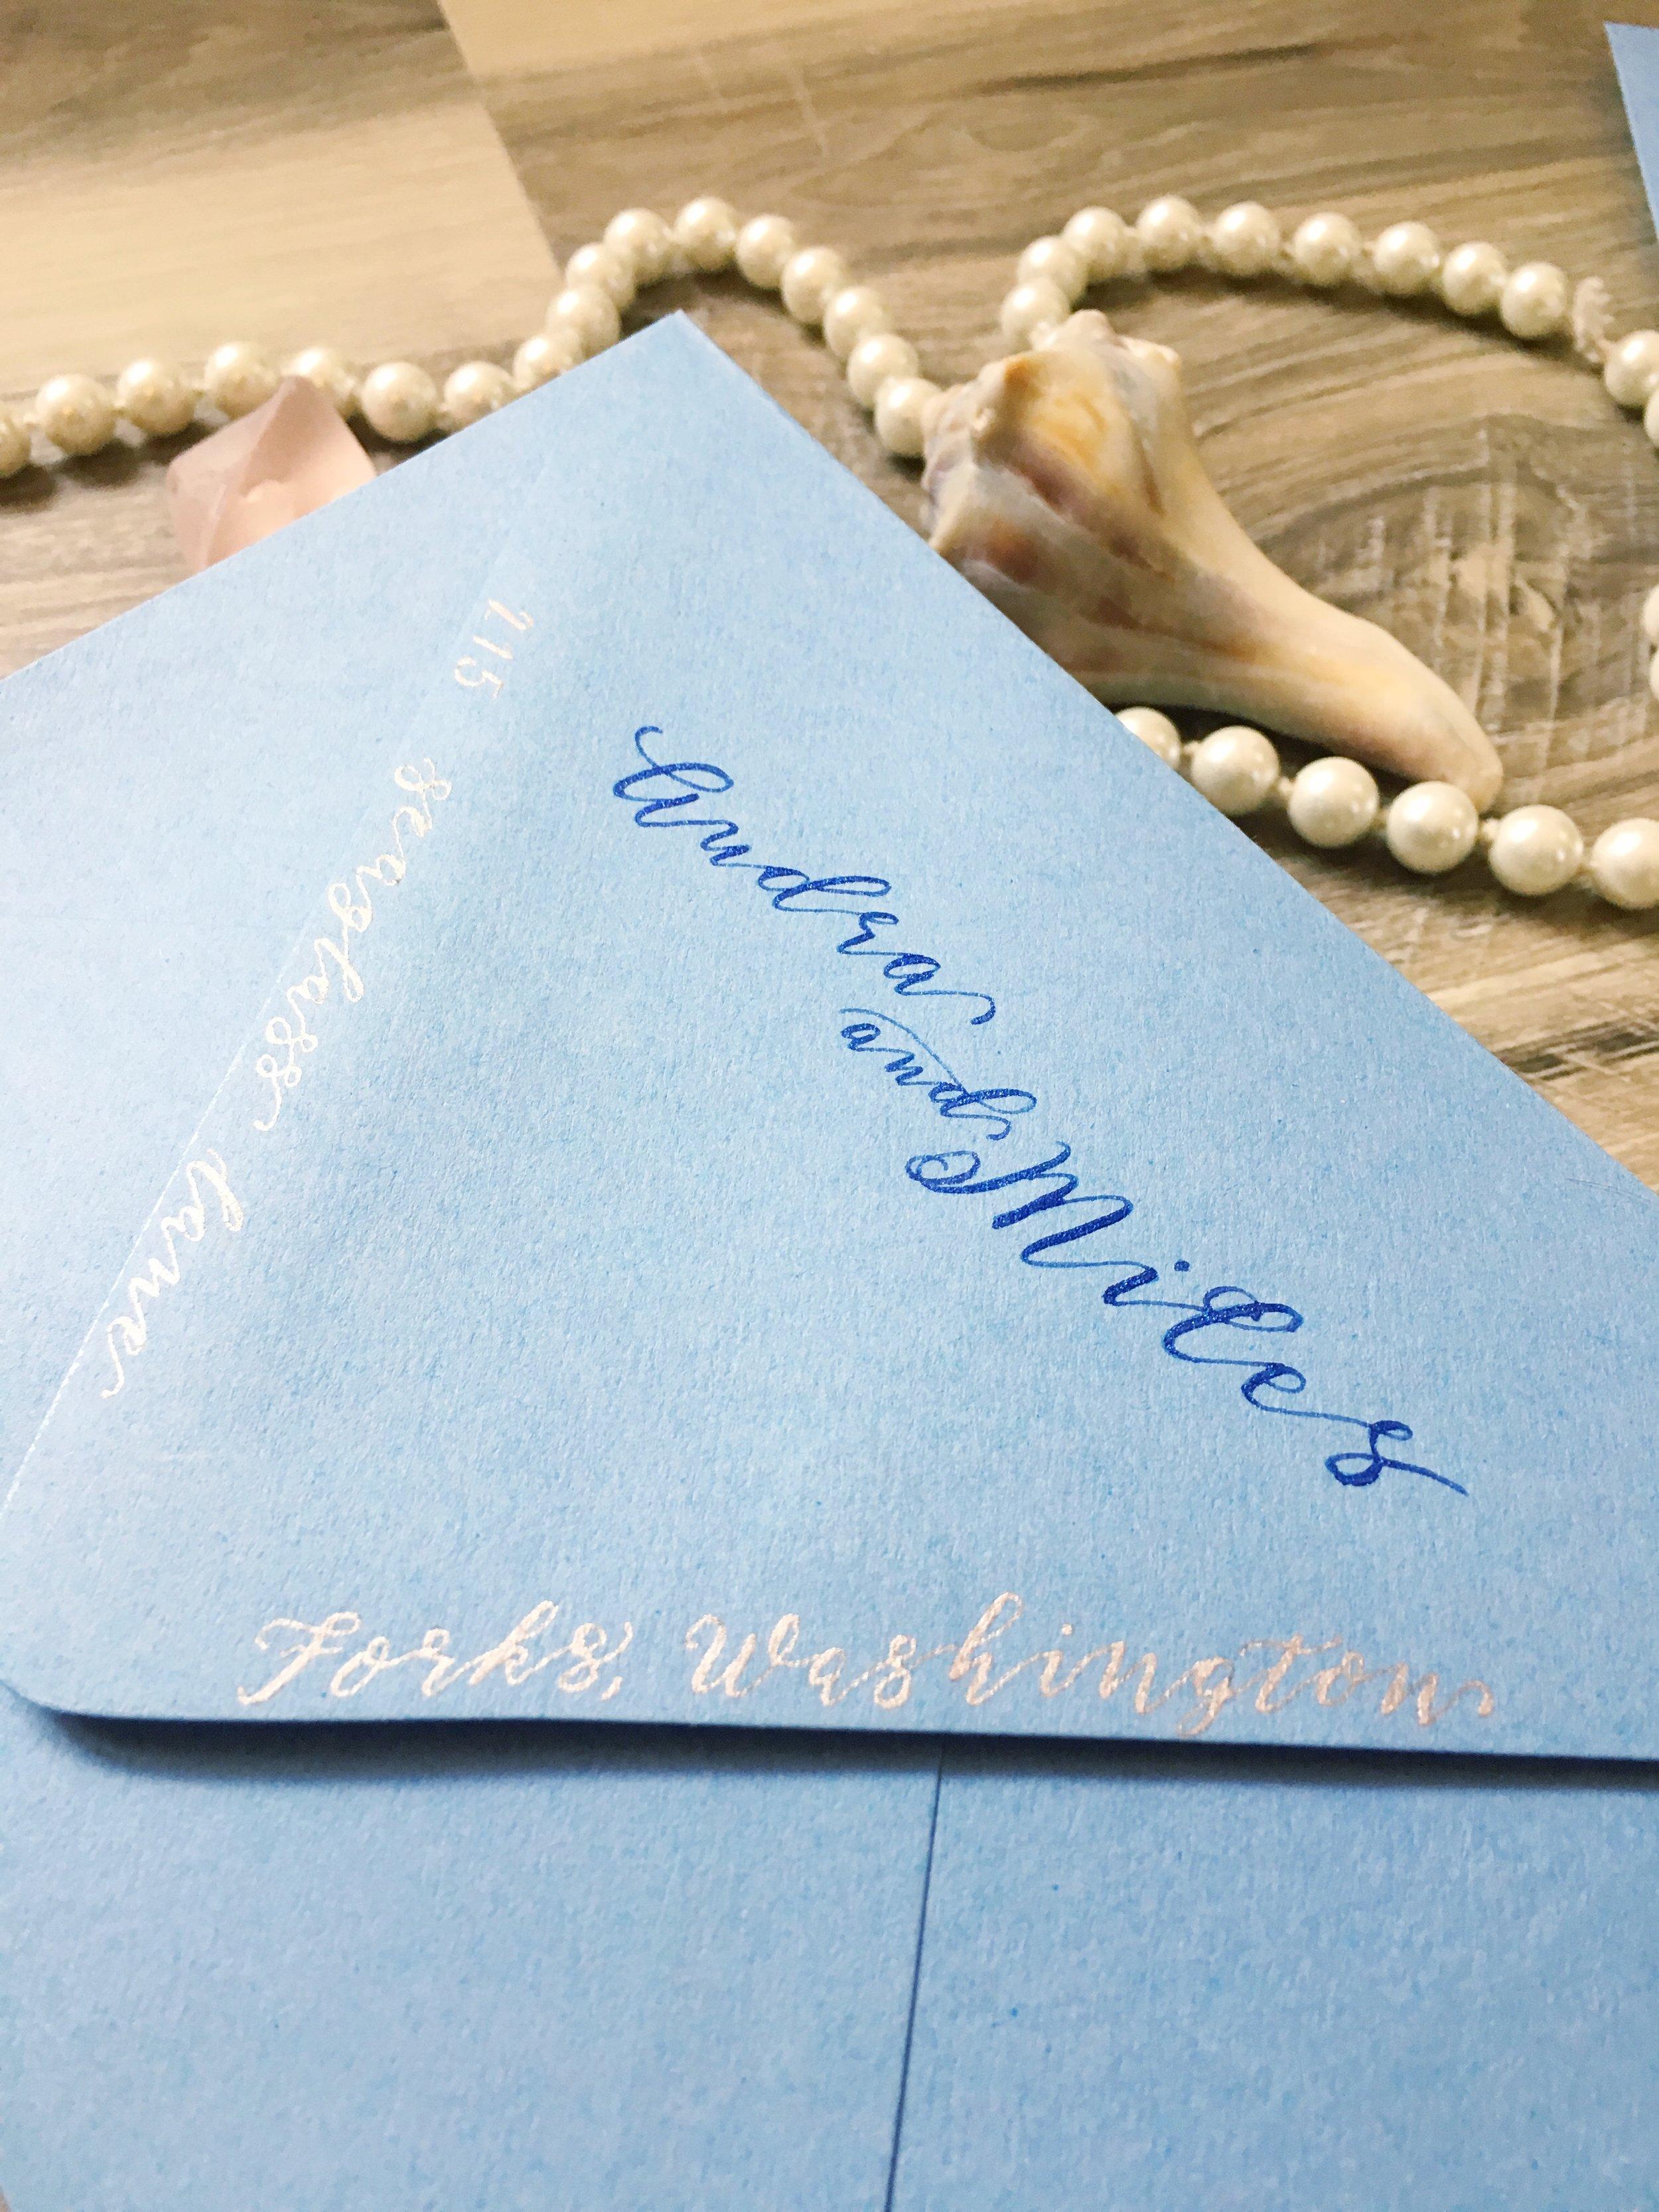 Central PA, York PA, JesSmith Designs, custom, wedding, invitations, bridal, announcements, save the date, birth, baby, motherhood, hanover, calligraphy, handlettering, wedding invitations, lancaster, gettysburg-06-20 17.18.04.jpg